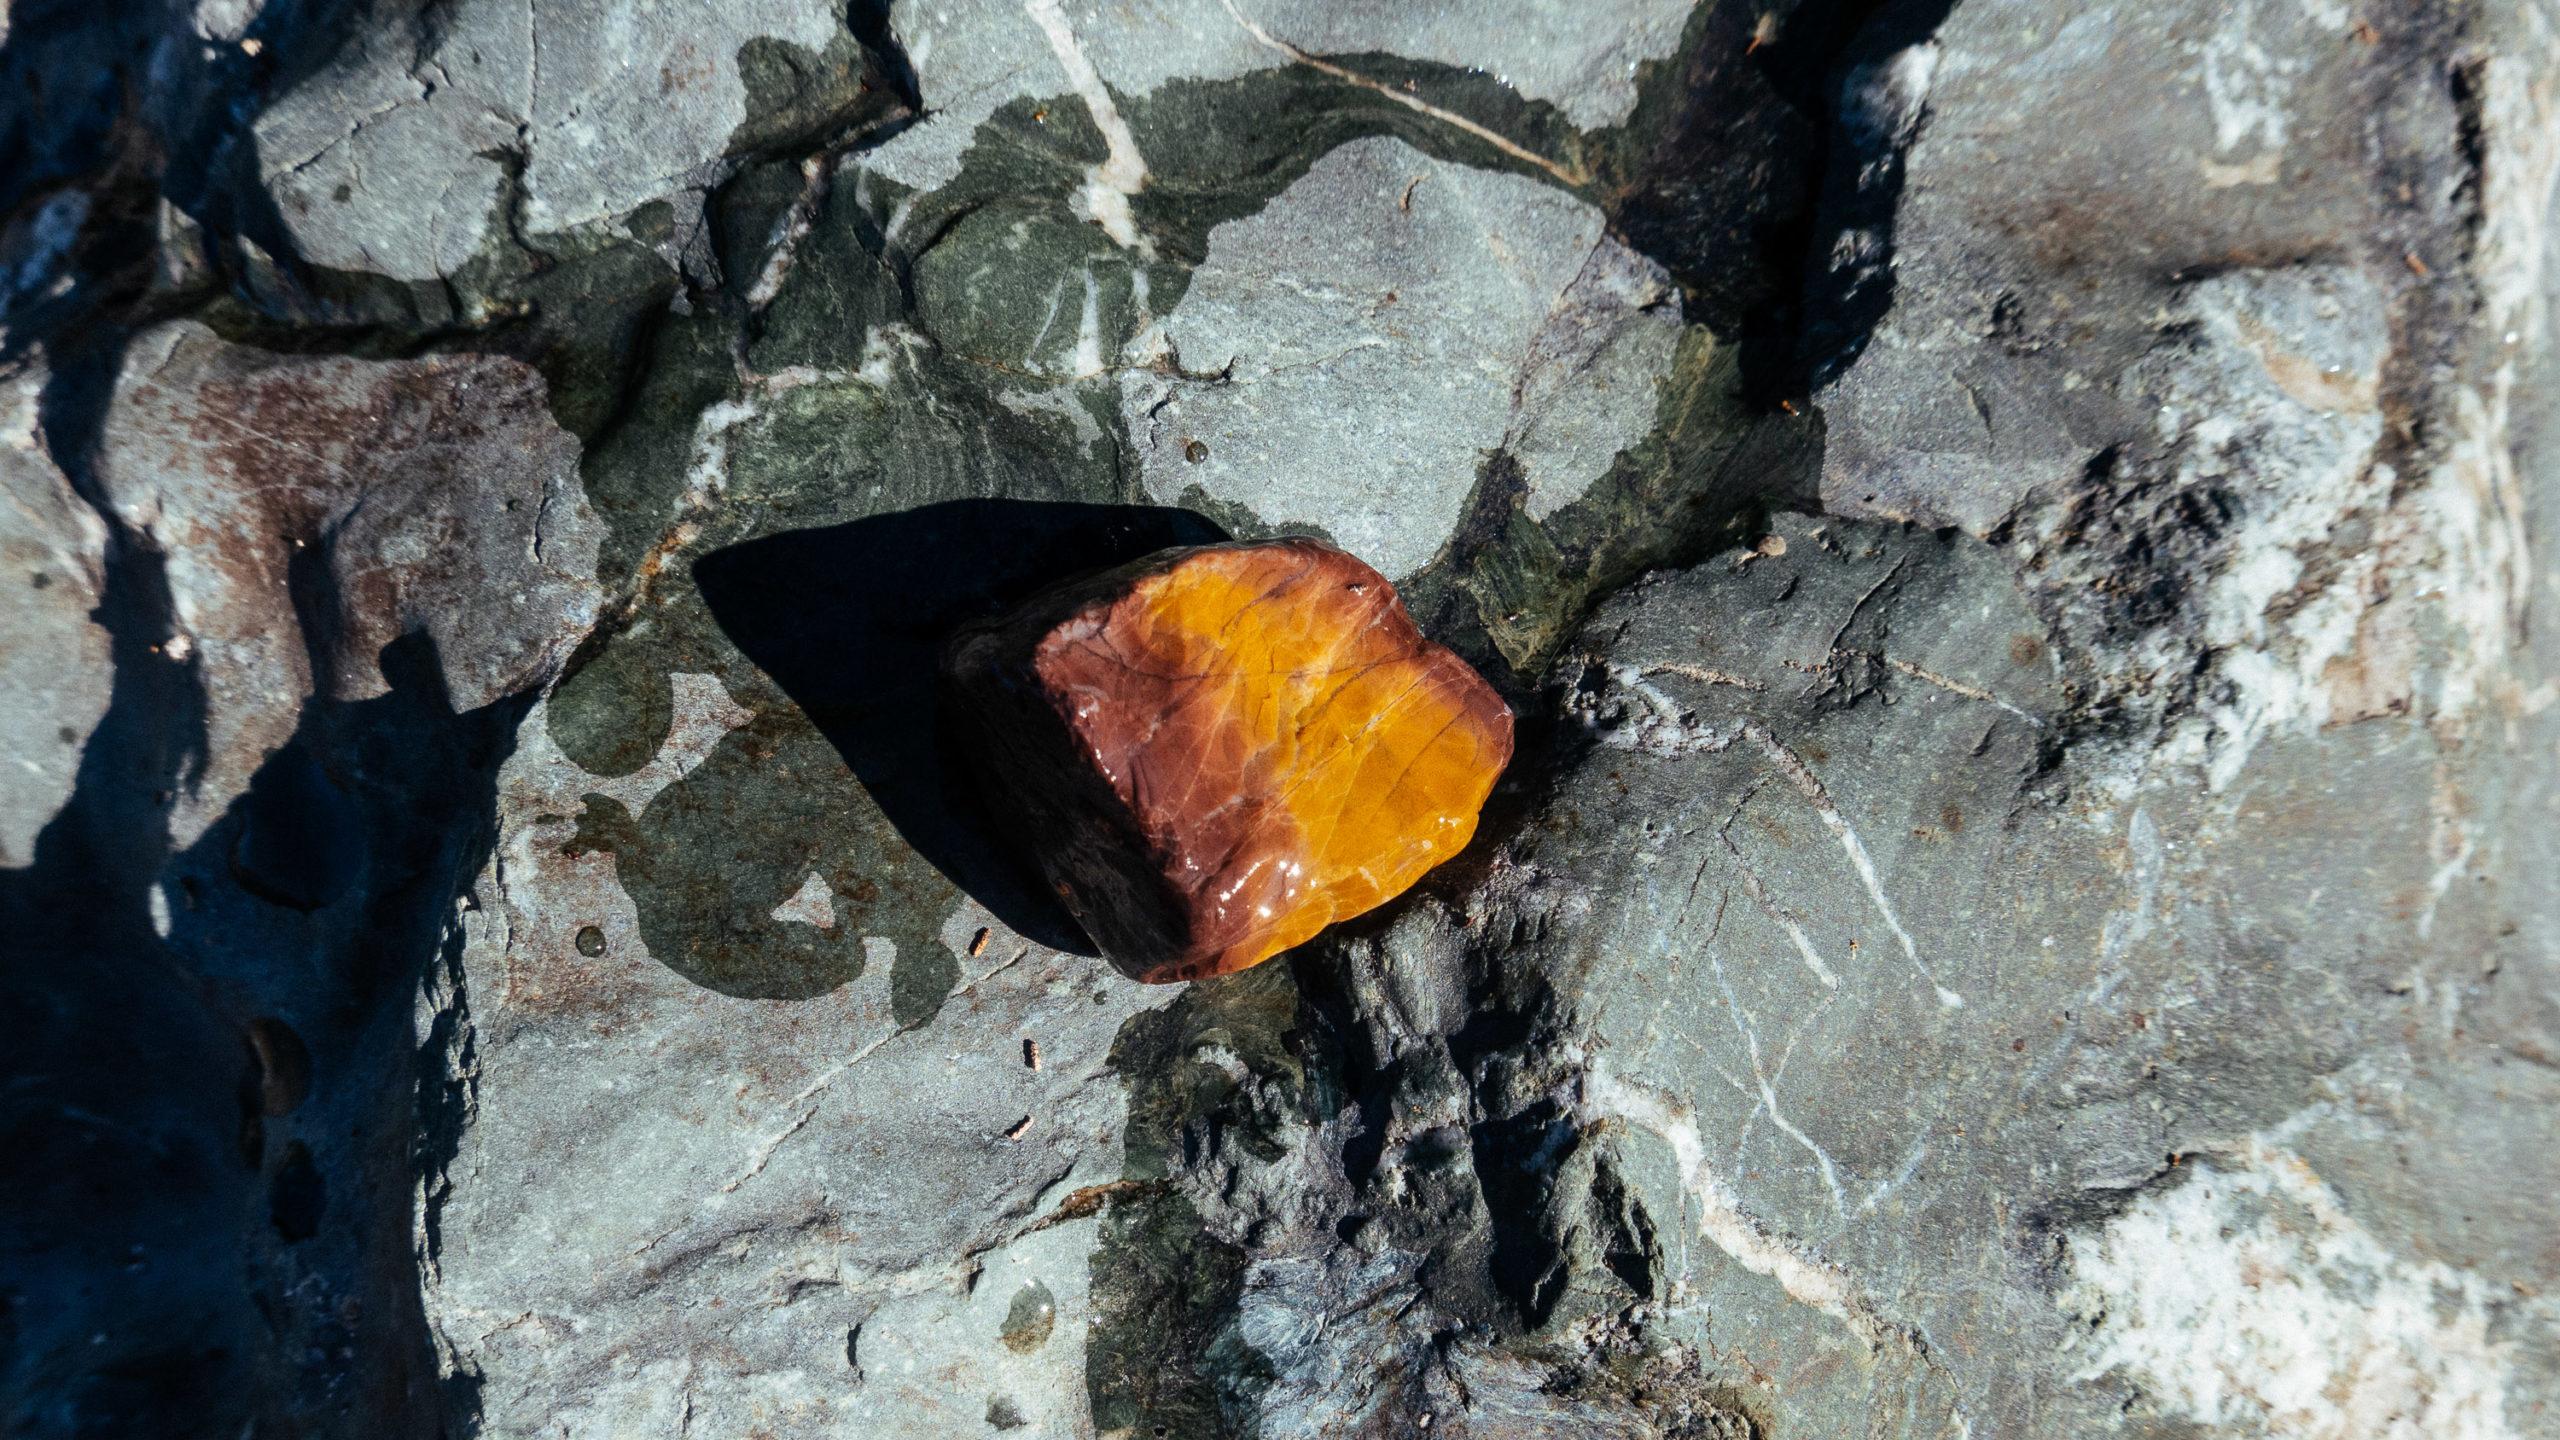 An orange colored rock